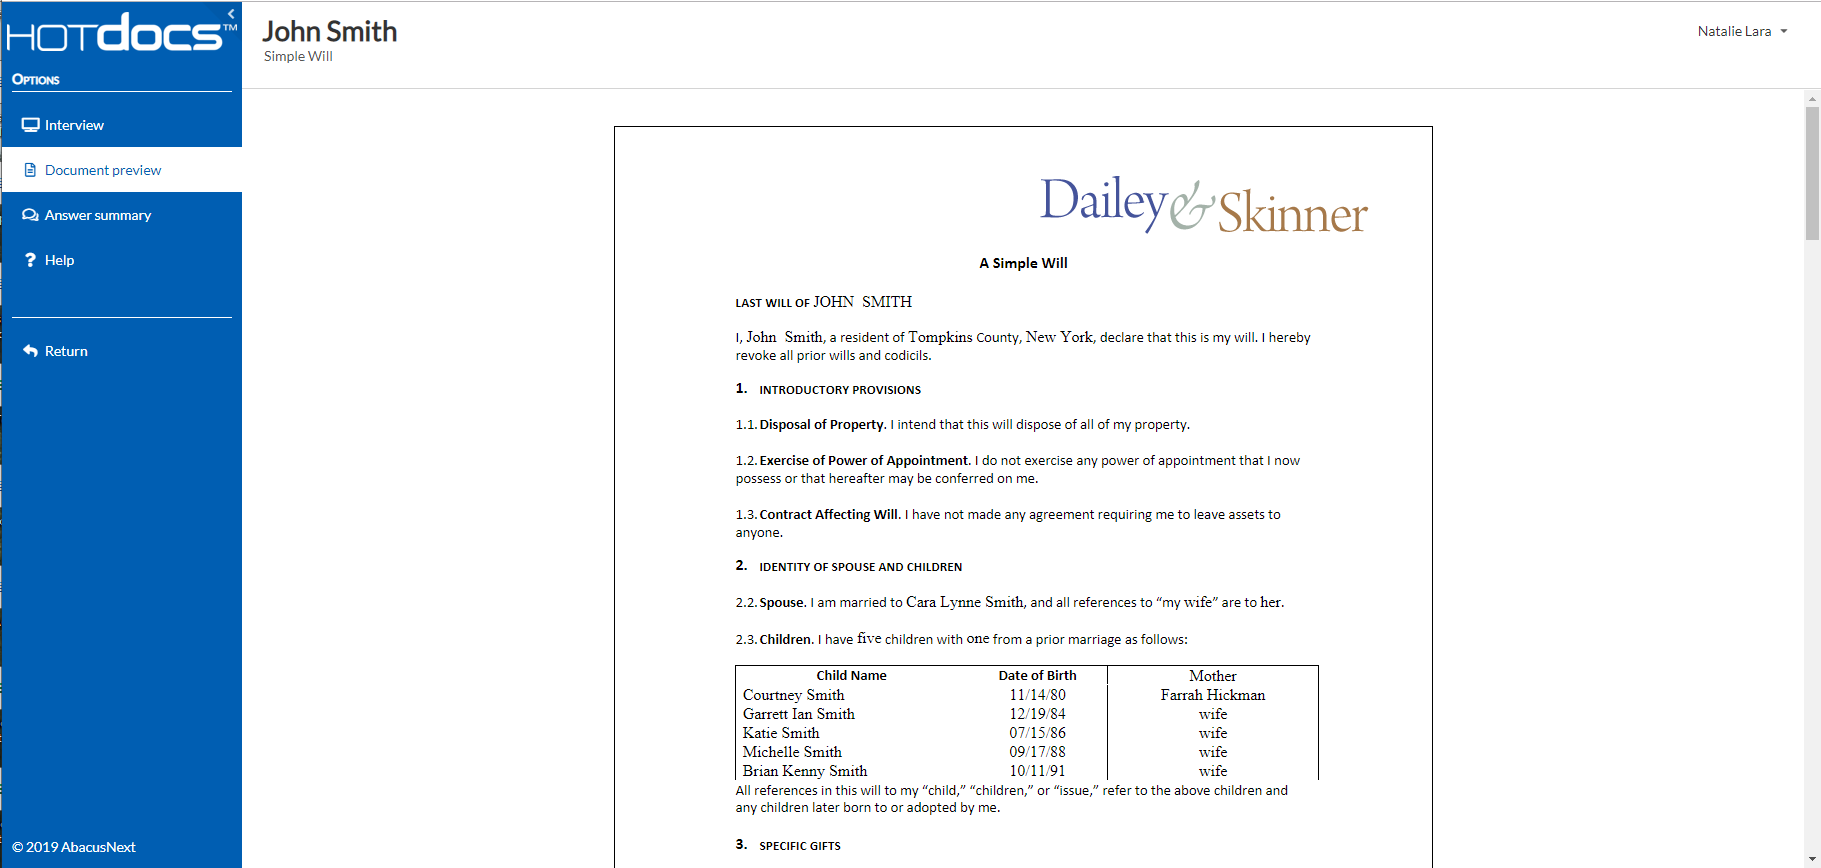 HotDocs Software - Advance Document Preview